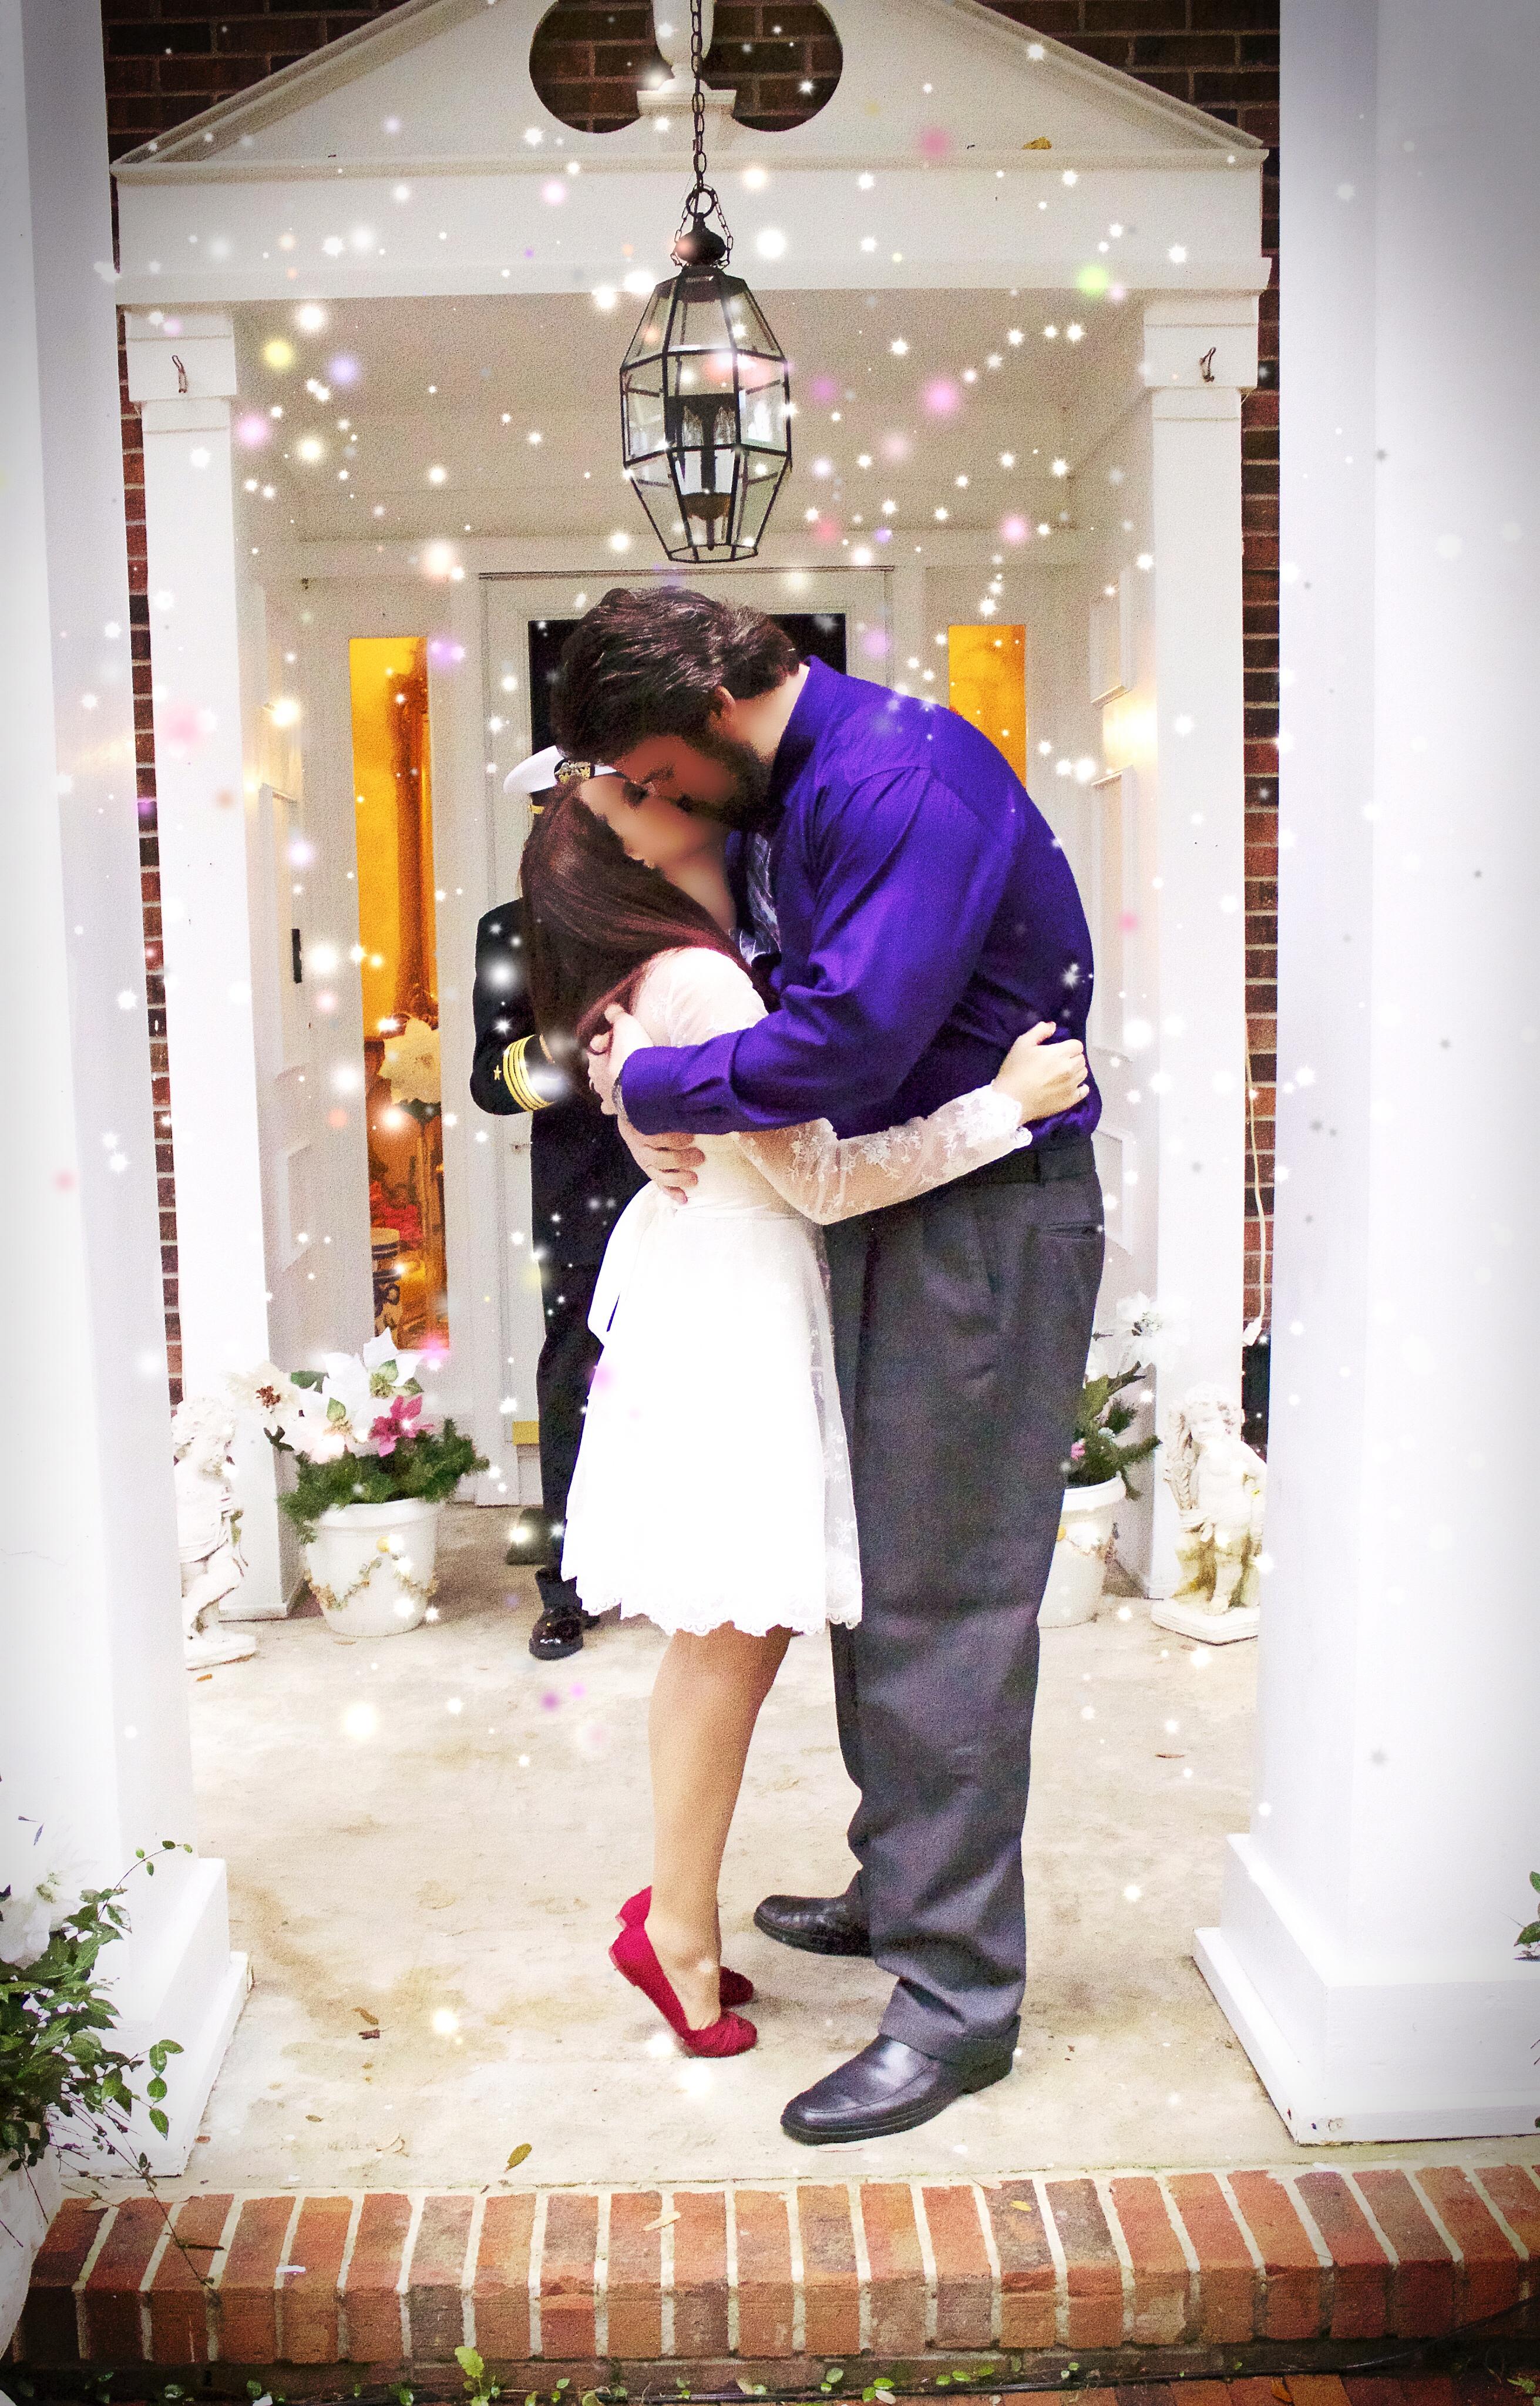 A Modern Love Story: Soul mates connected through Social Media. Jillian and Storm Walker's Wedding Story